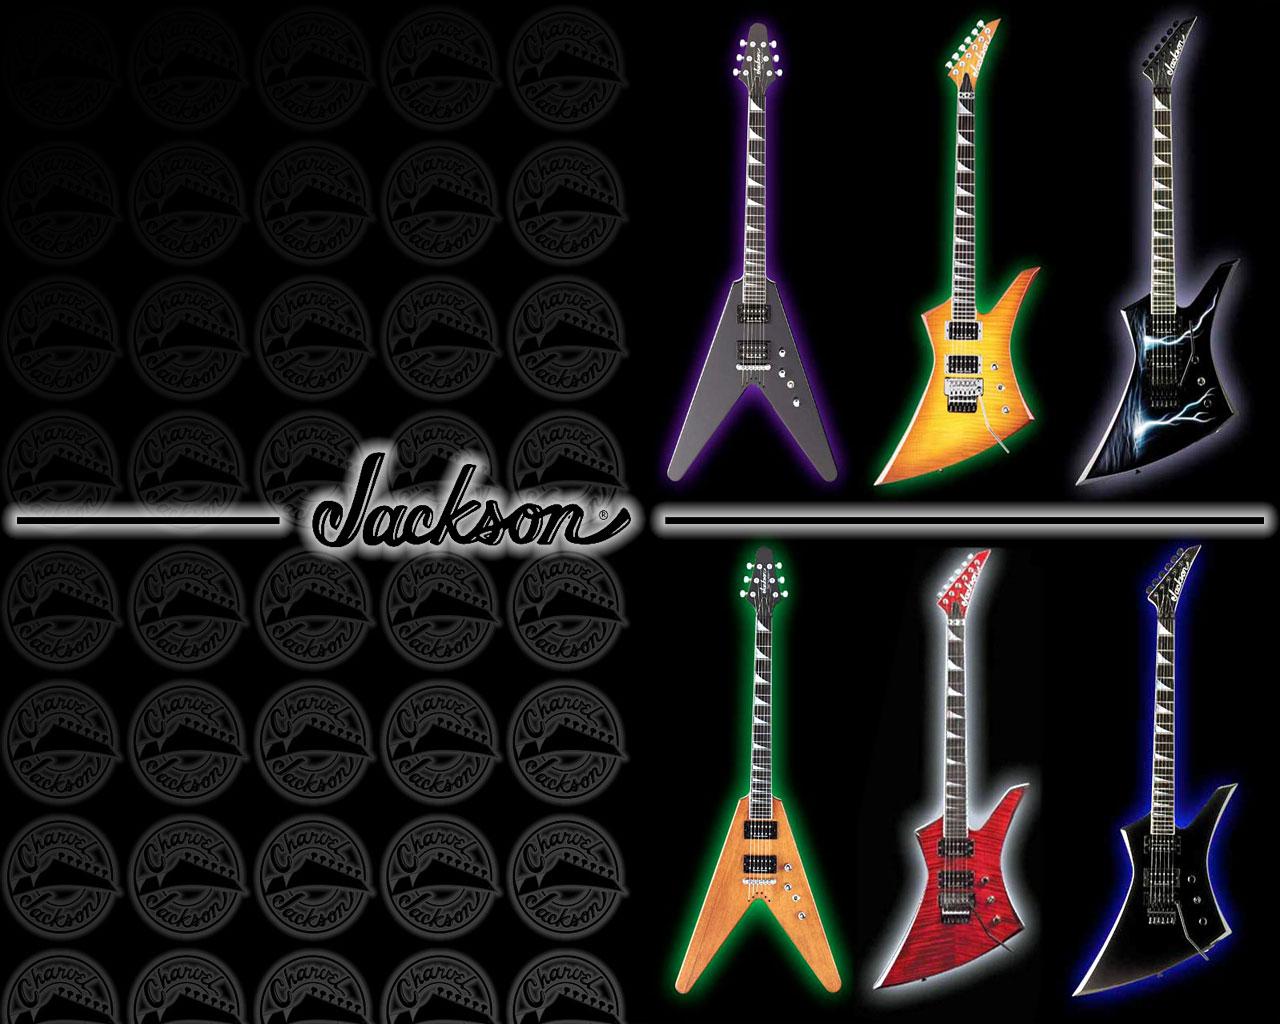 gitari-jackson